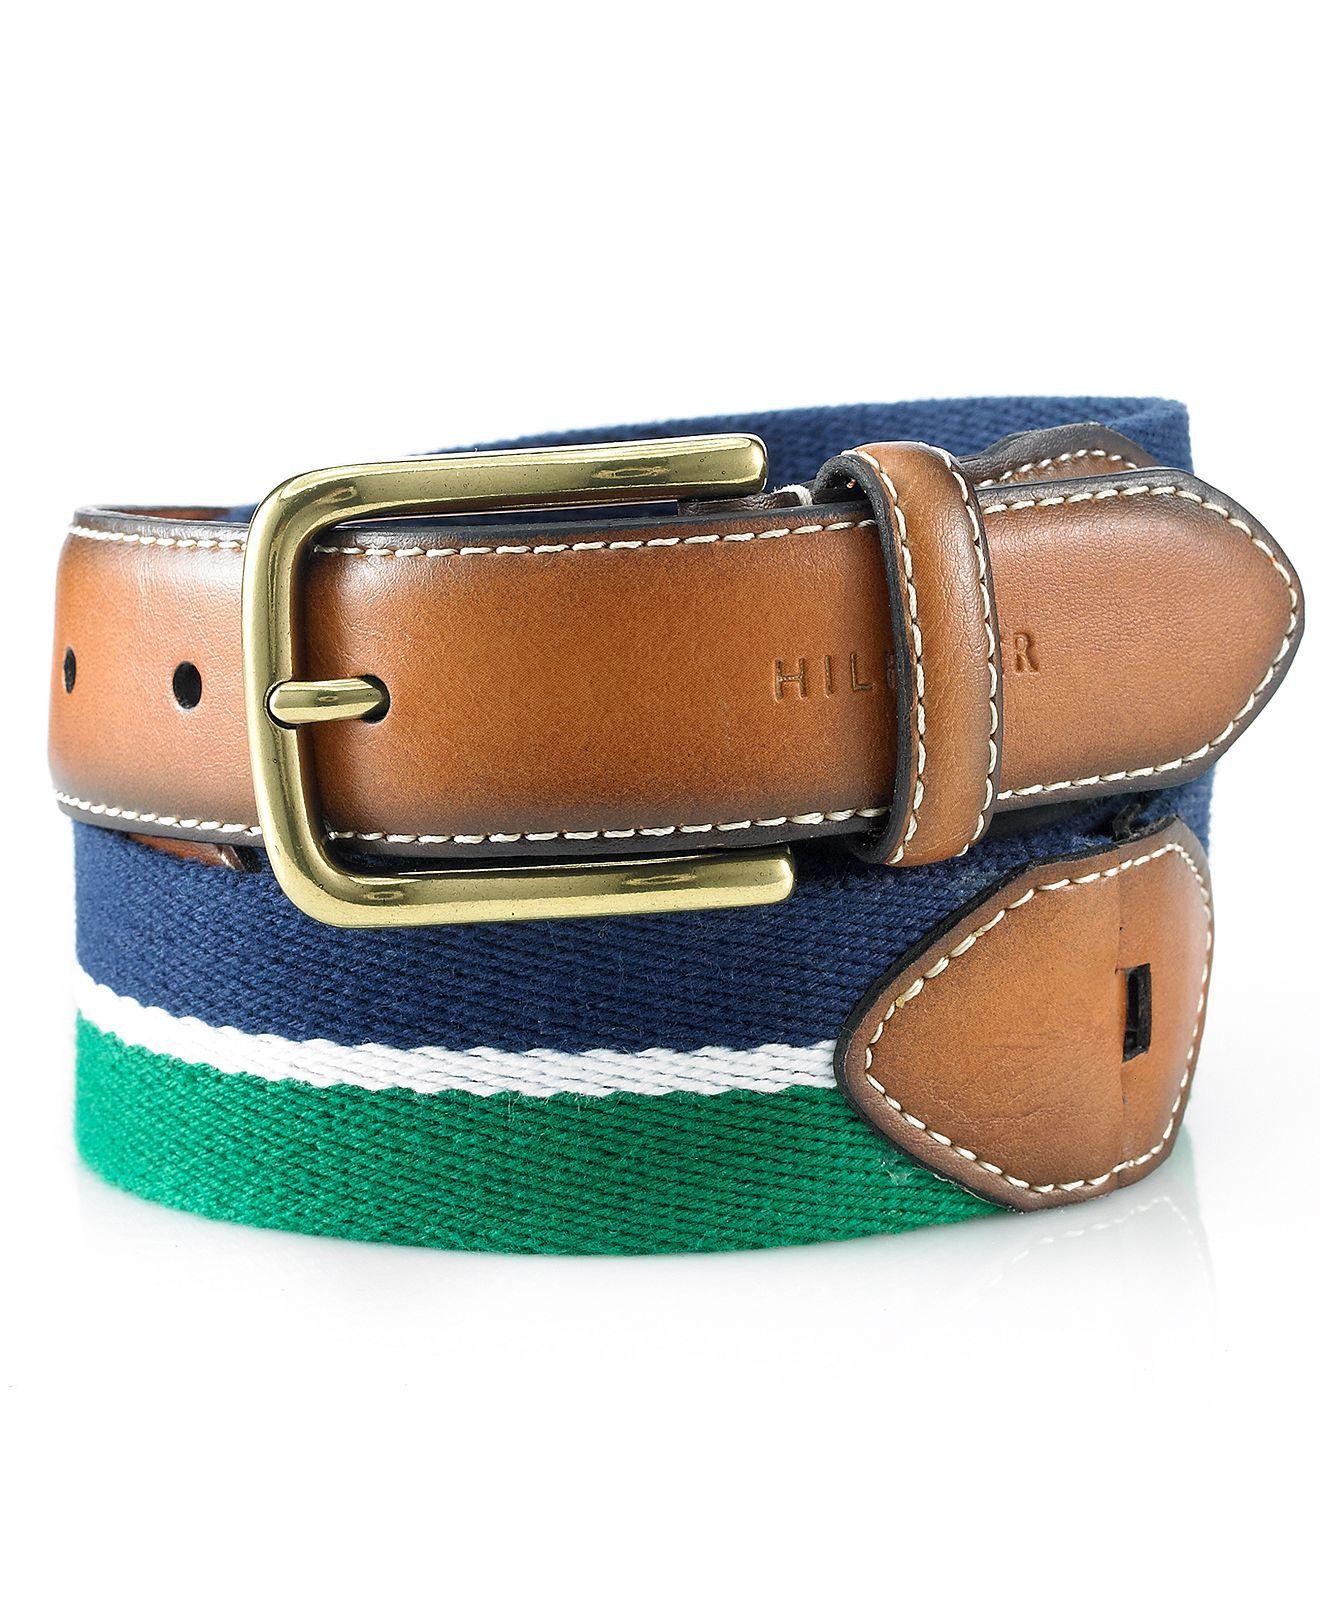 Tommy Hilfiger Men/'s Khaki//brown//navy Belt Canvas And Ribbon 35mm